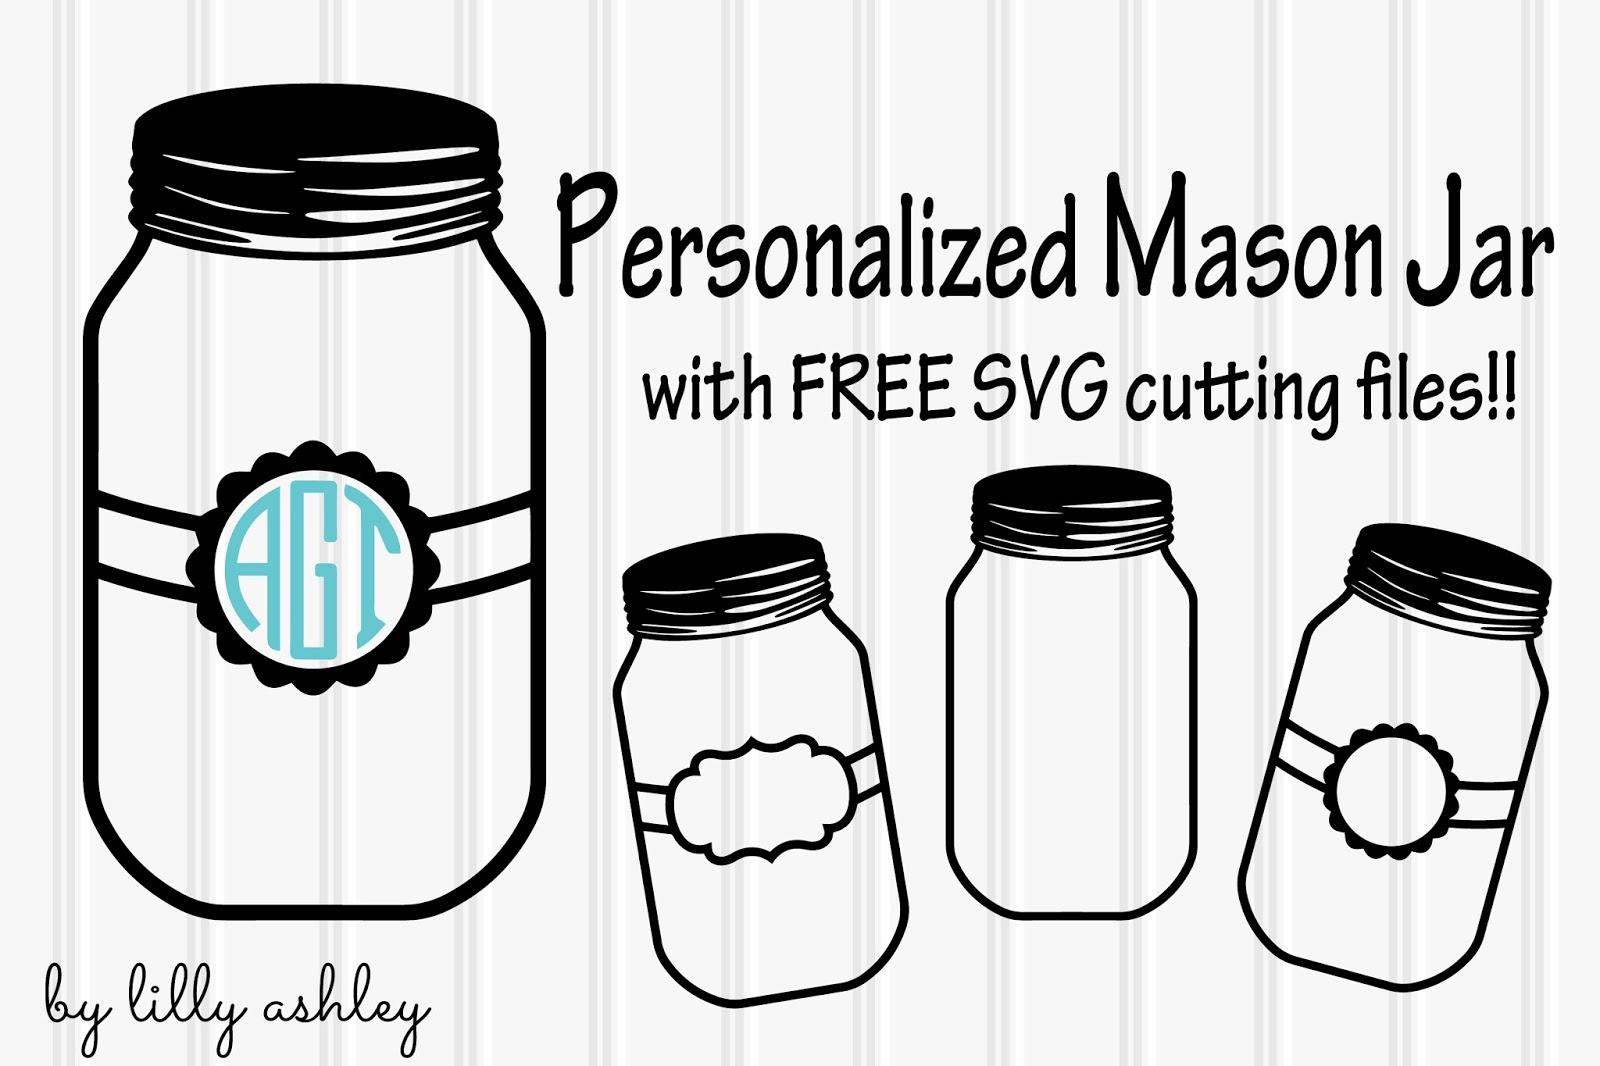 Make It Create Free Cut Files And Printables Freebie Cutting Files Mason Jars Freecutfiles